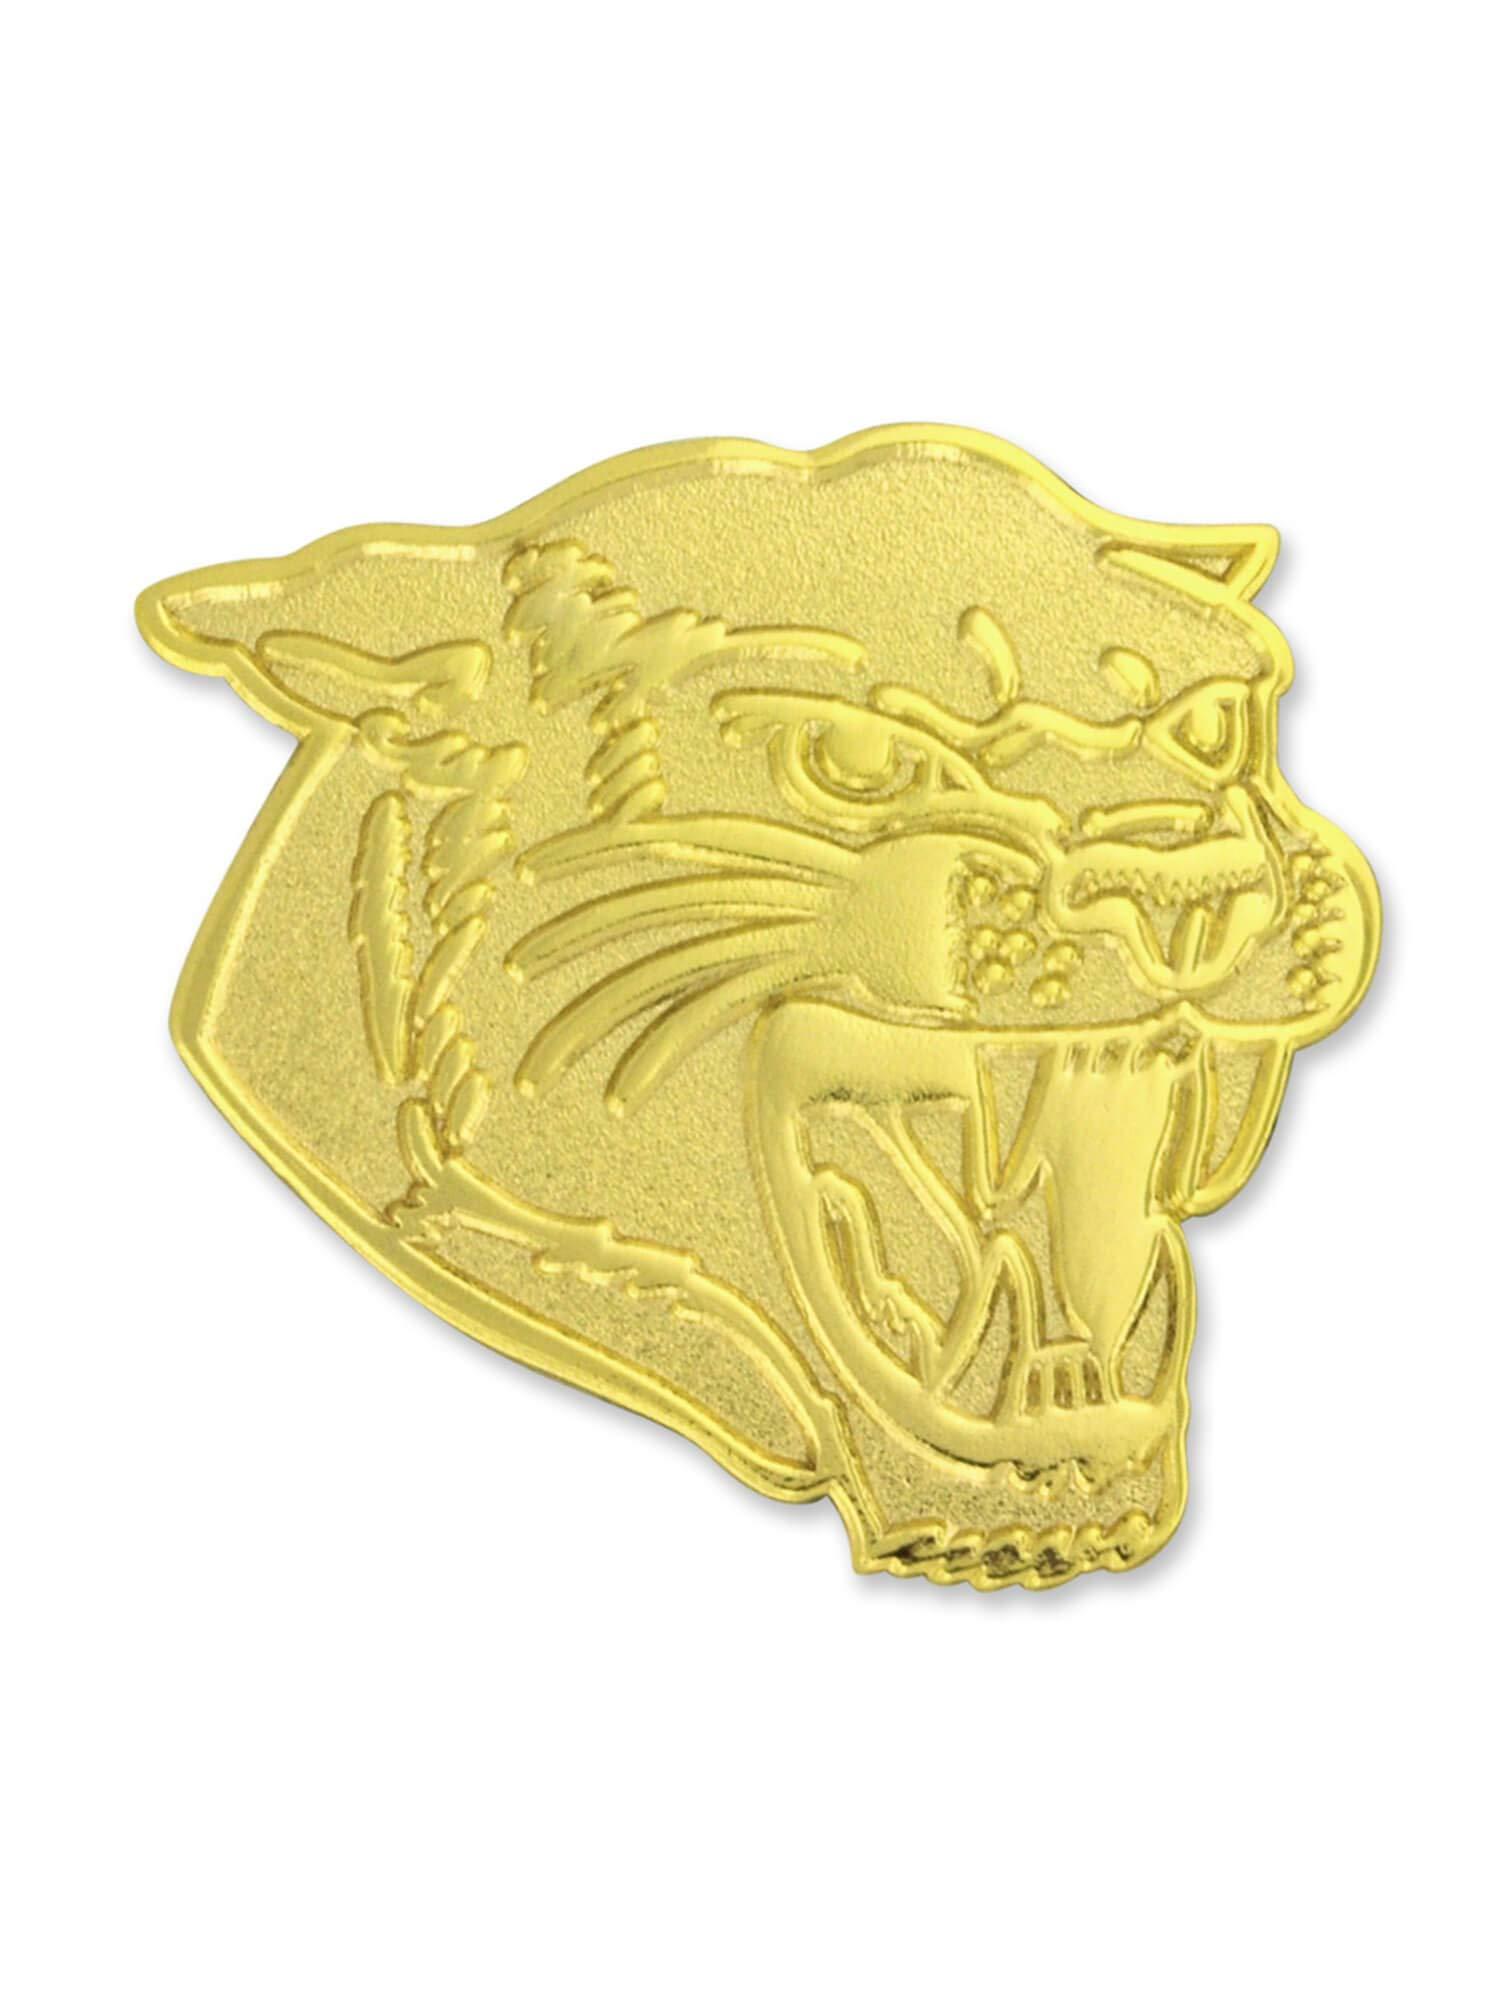 PinMart Gold Chenille Cougars Mascot Letterman's Jacket Lapel Pin 1''